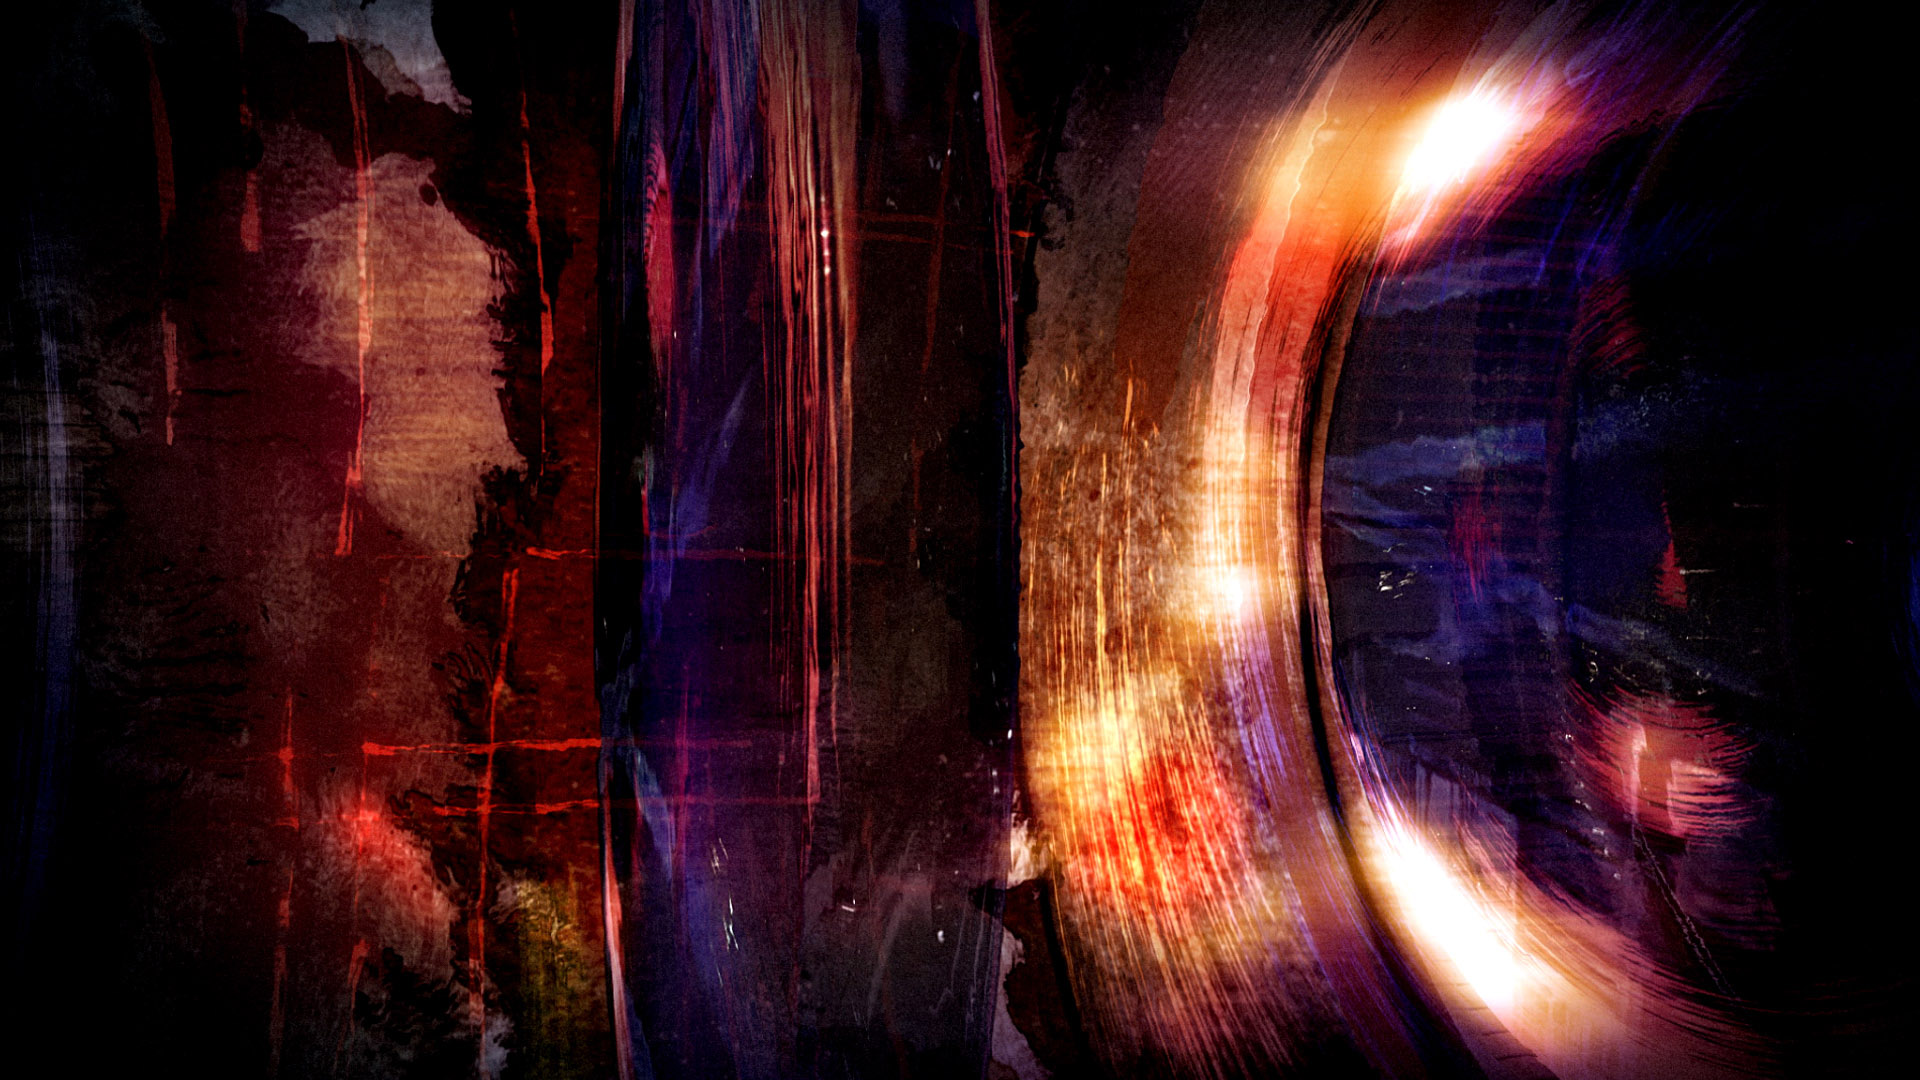 AKA_Teaser_Dreams_Texted_PreLaunch_Stereo_ProResHQ (00443)_web.jpg